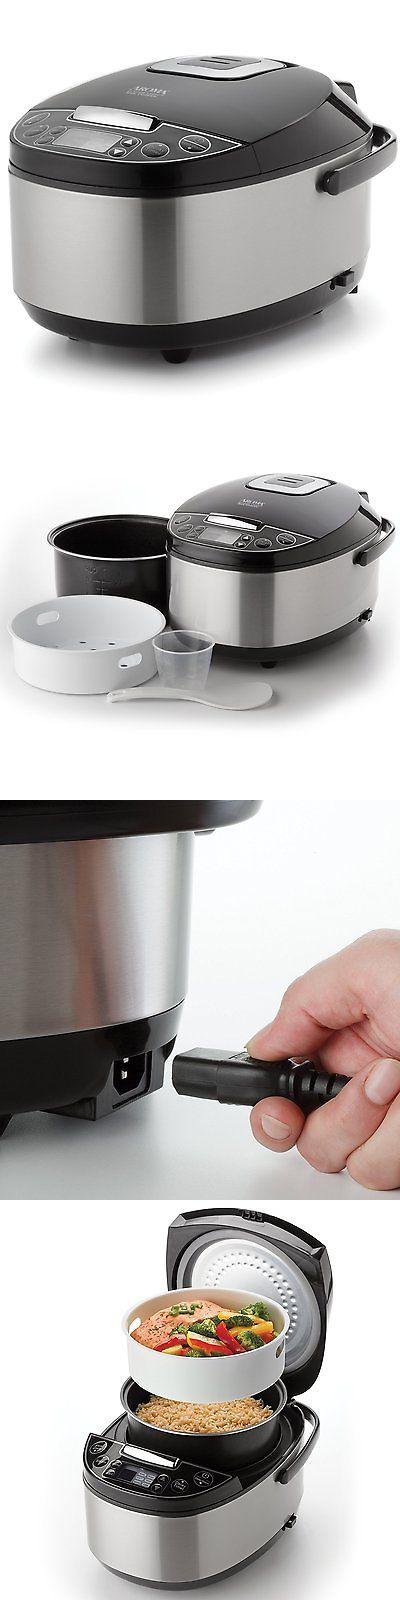 small kitchen appliances  aroma professional 12cup egg shape digital rice cooker slowcooker food small kitchen appliances  aroma professional 12cup egg shape      rh   pinterest com